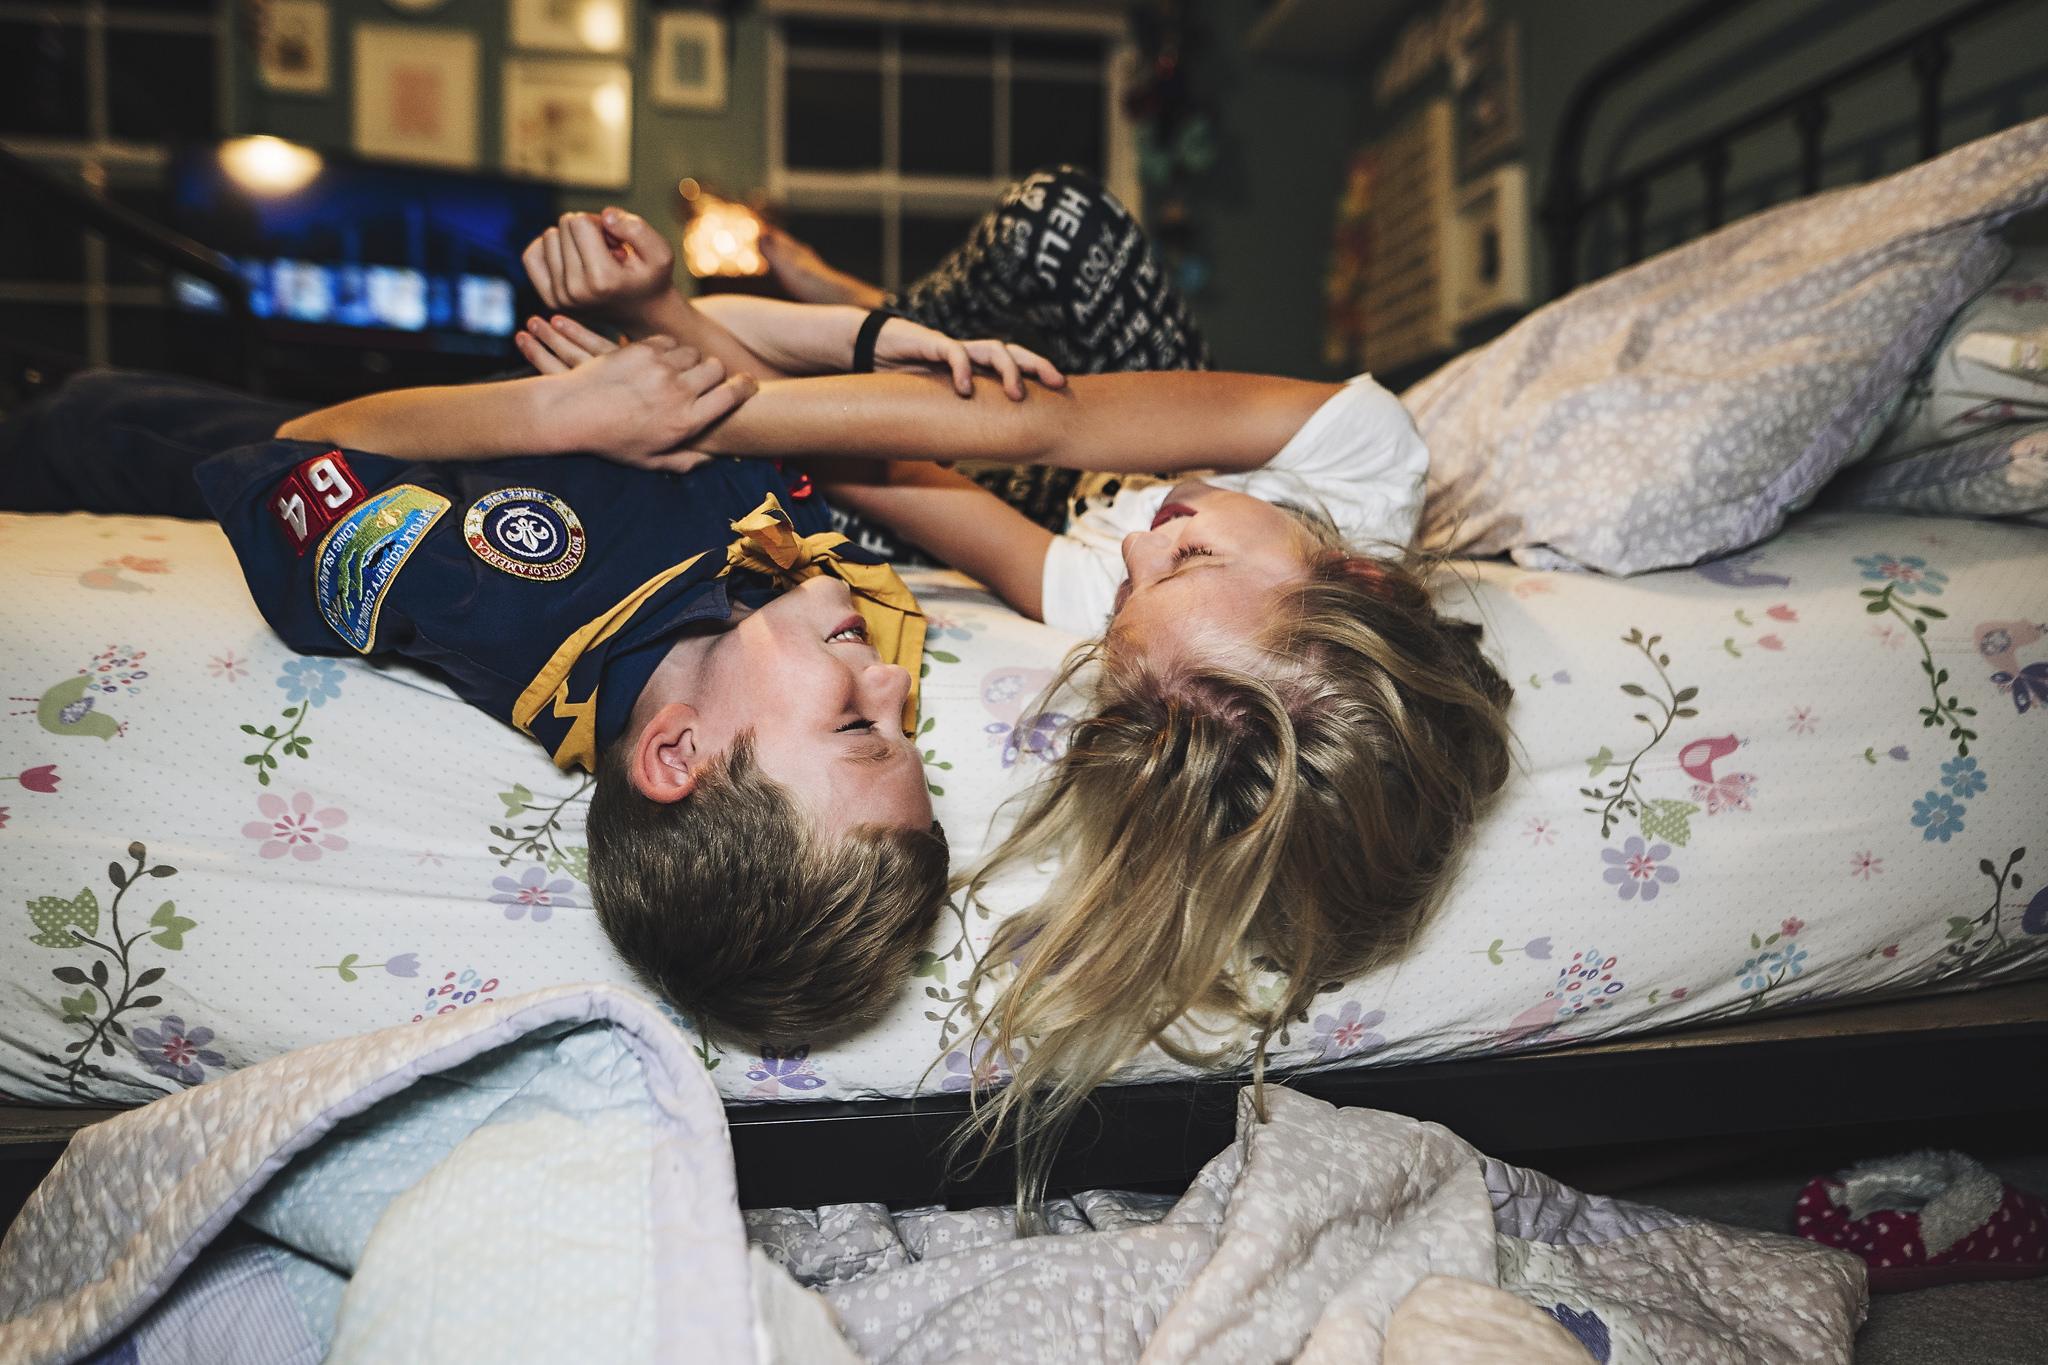 hello-olivia-photography-family-photojournalism-365-tutorial-documenting-bedtime-rituals-lowlight-kids-documentary-and lifestyle-photographer-long-island-new-york34.jpg